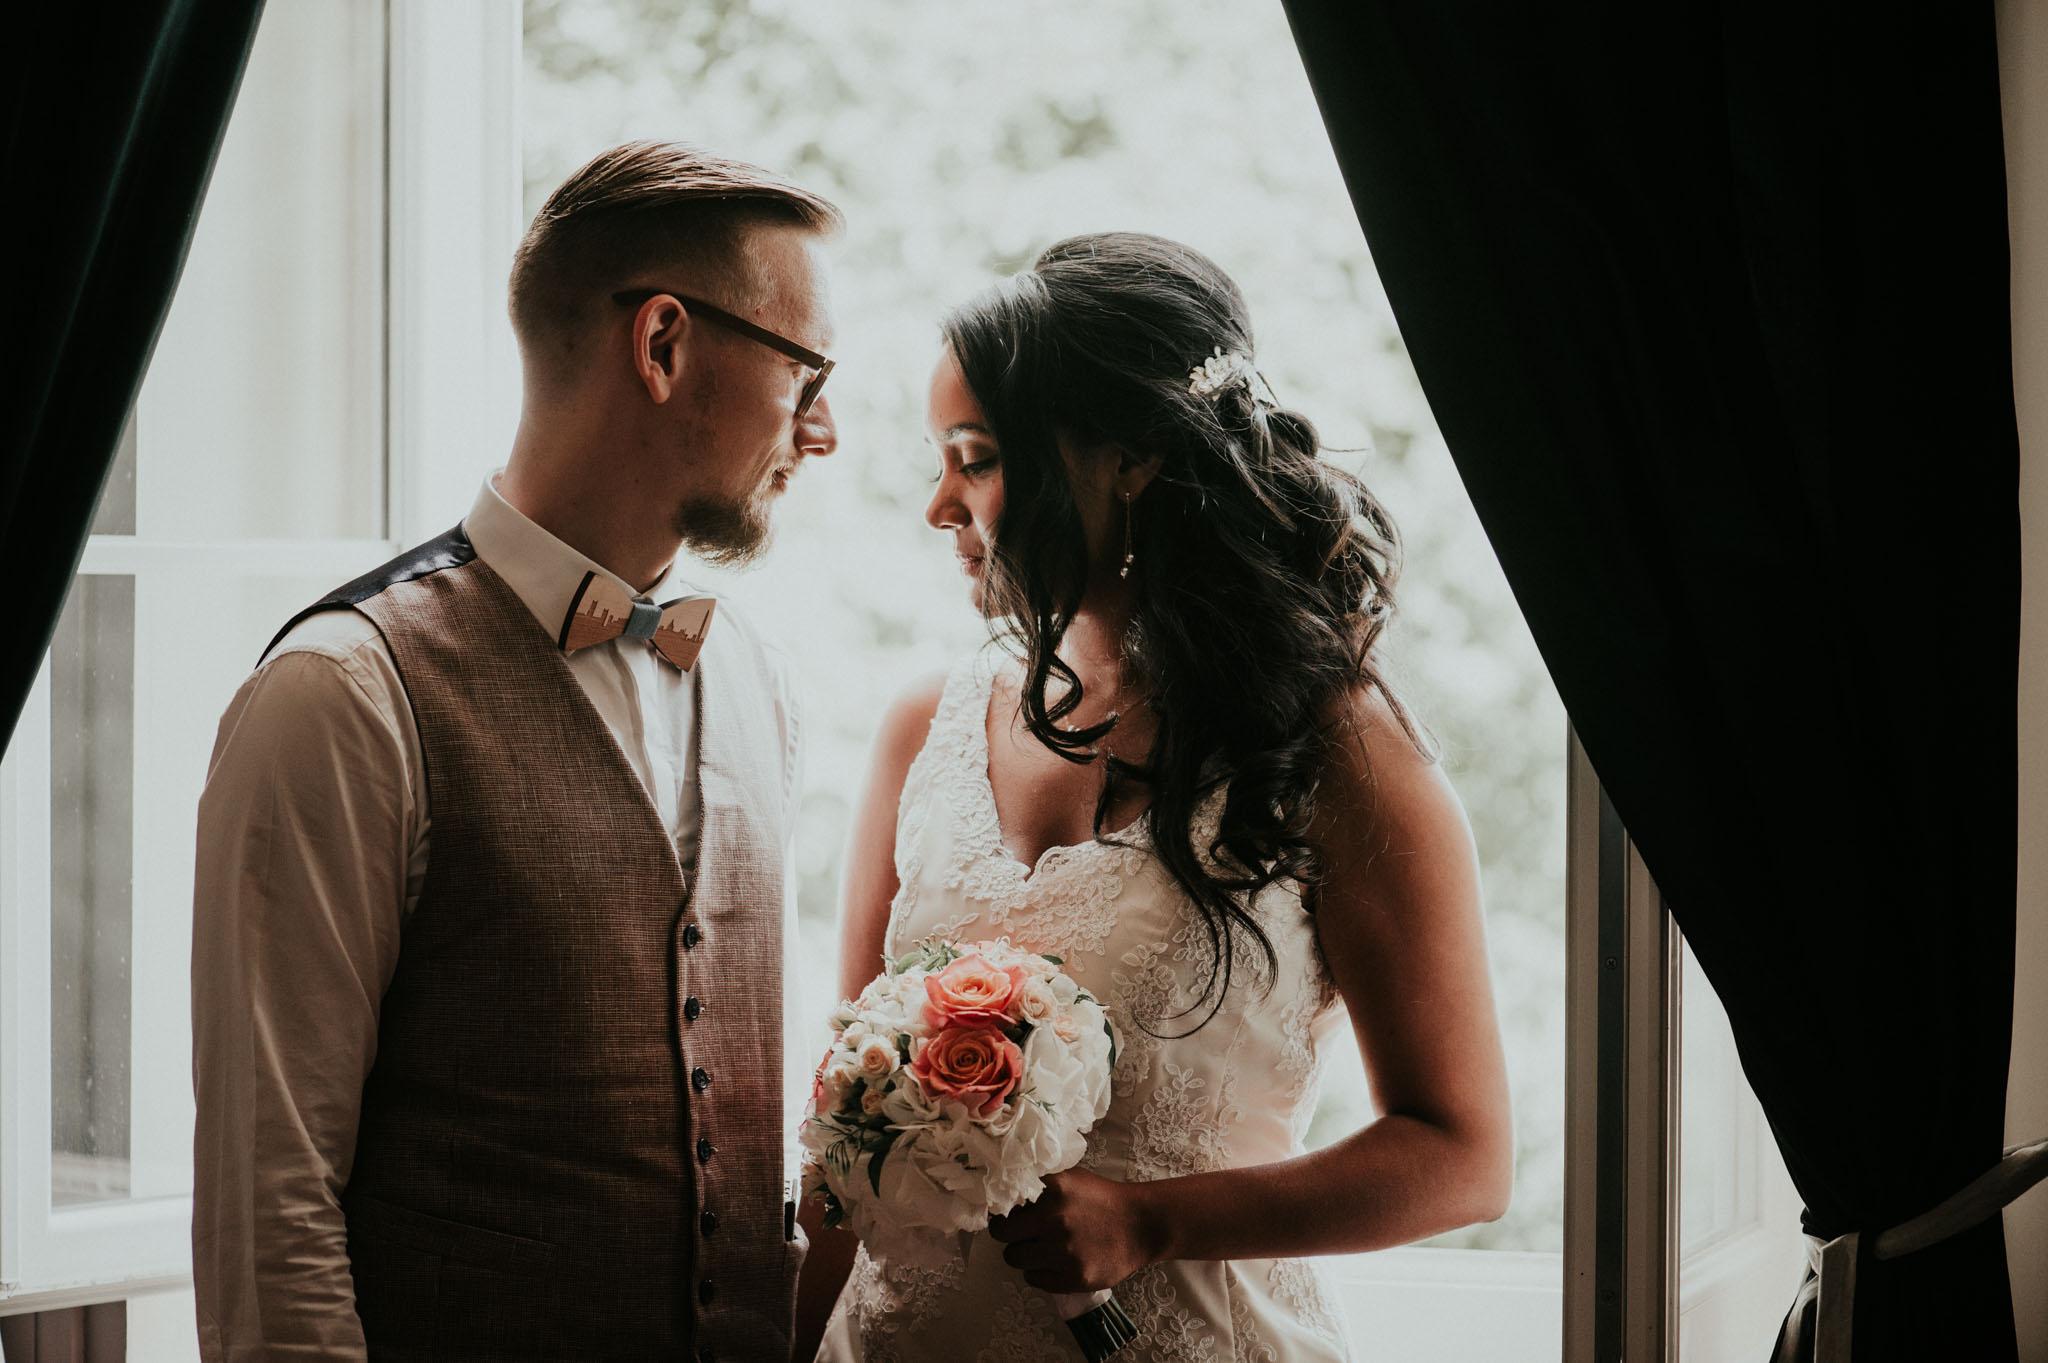 2017-07-15 - DSC_7829 - photographe - mariage - www.lauriediazwedding.com.jpg